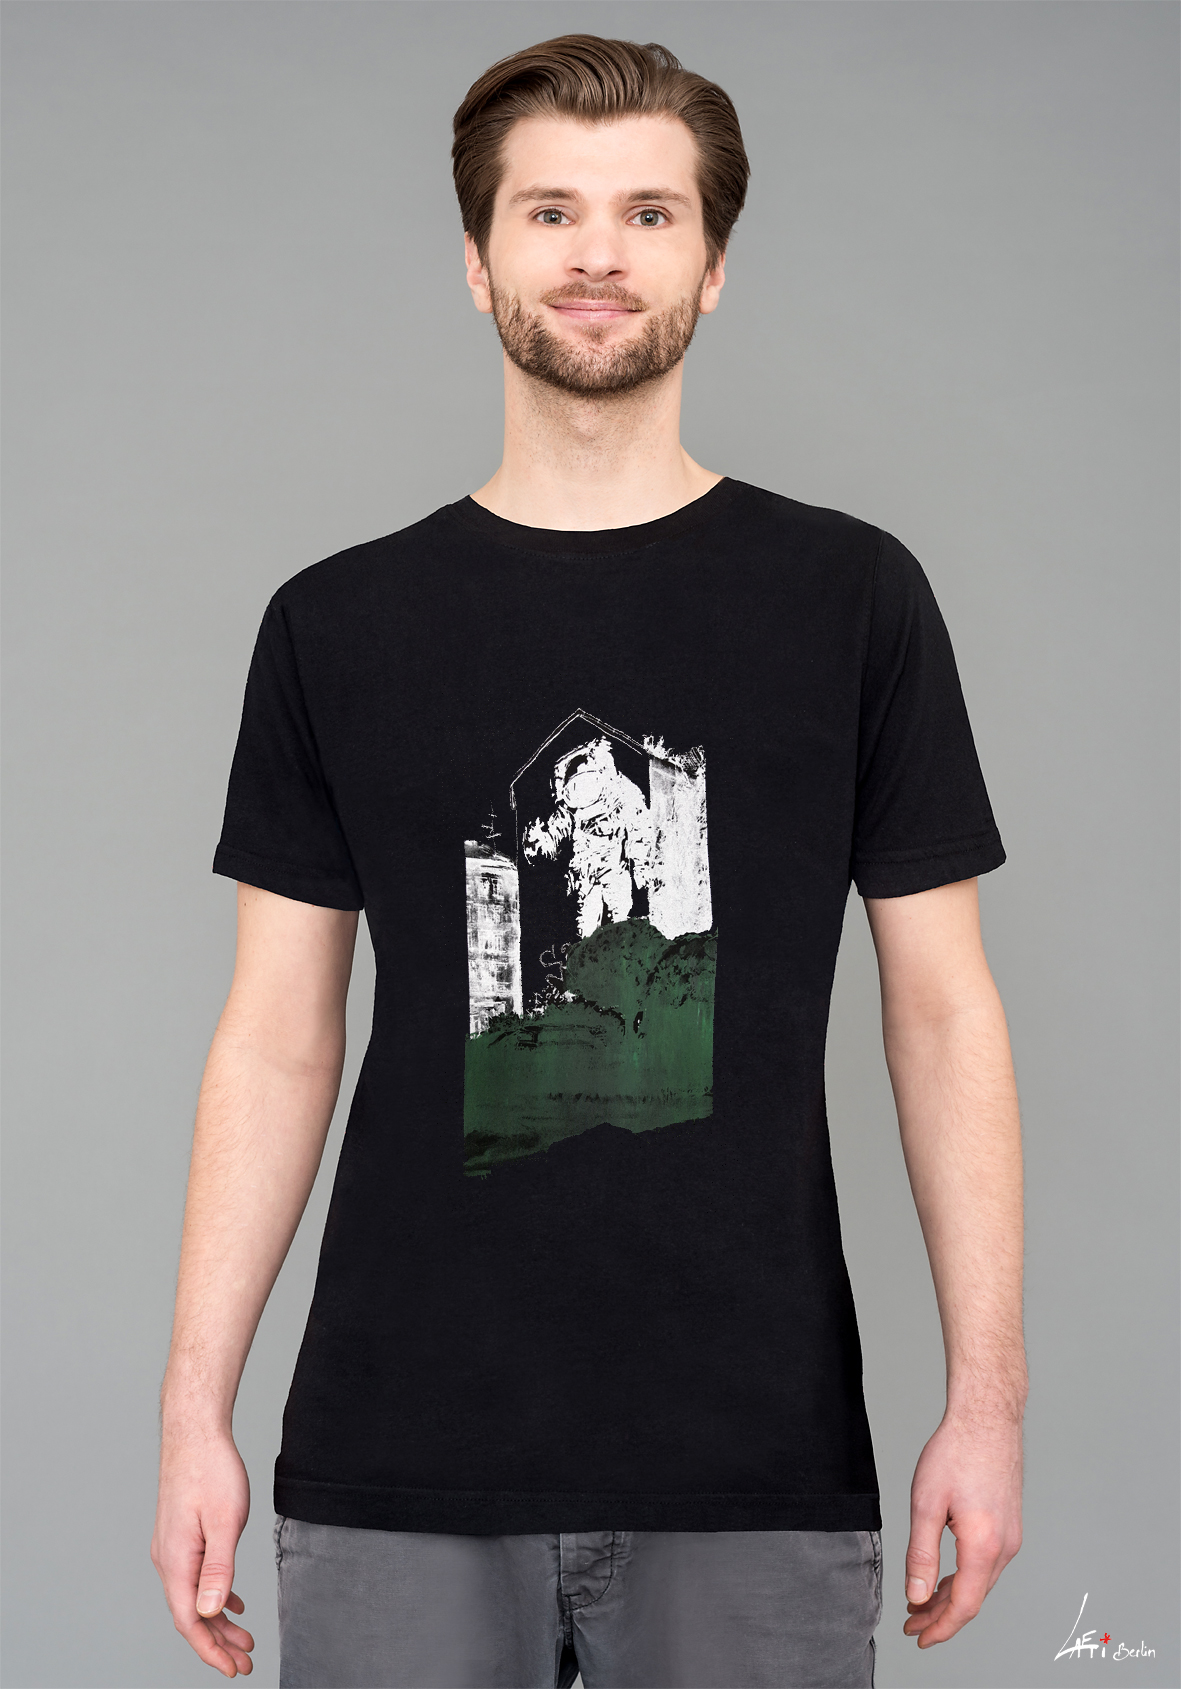 T-shirt Black - Man - Astronaut/Kosmonaut